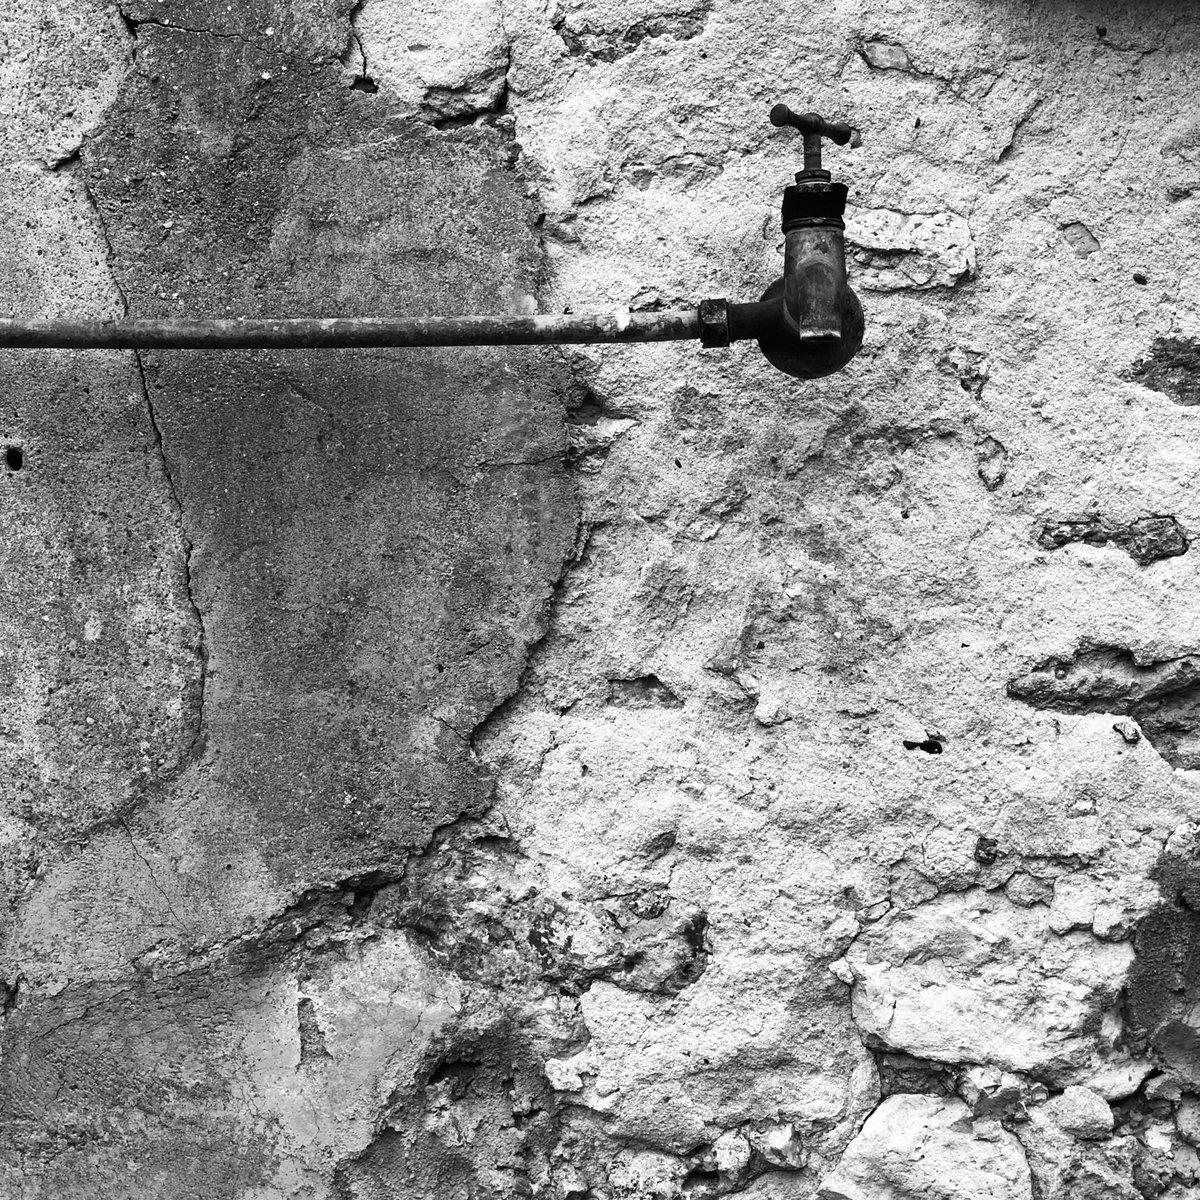 #photography #photo #blackandwhite #art #Monochrome #Water #robinet ©JocelynPhotospic.twitter.com/n43WvYBa5P